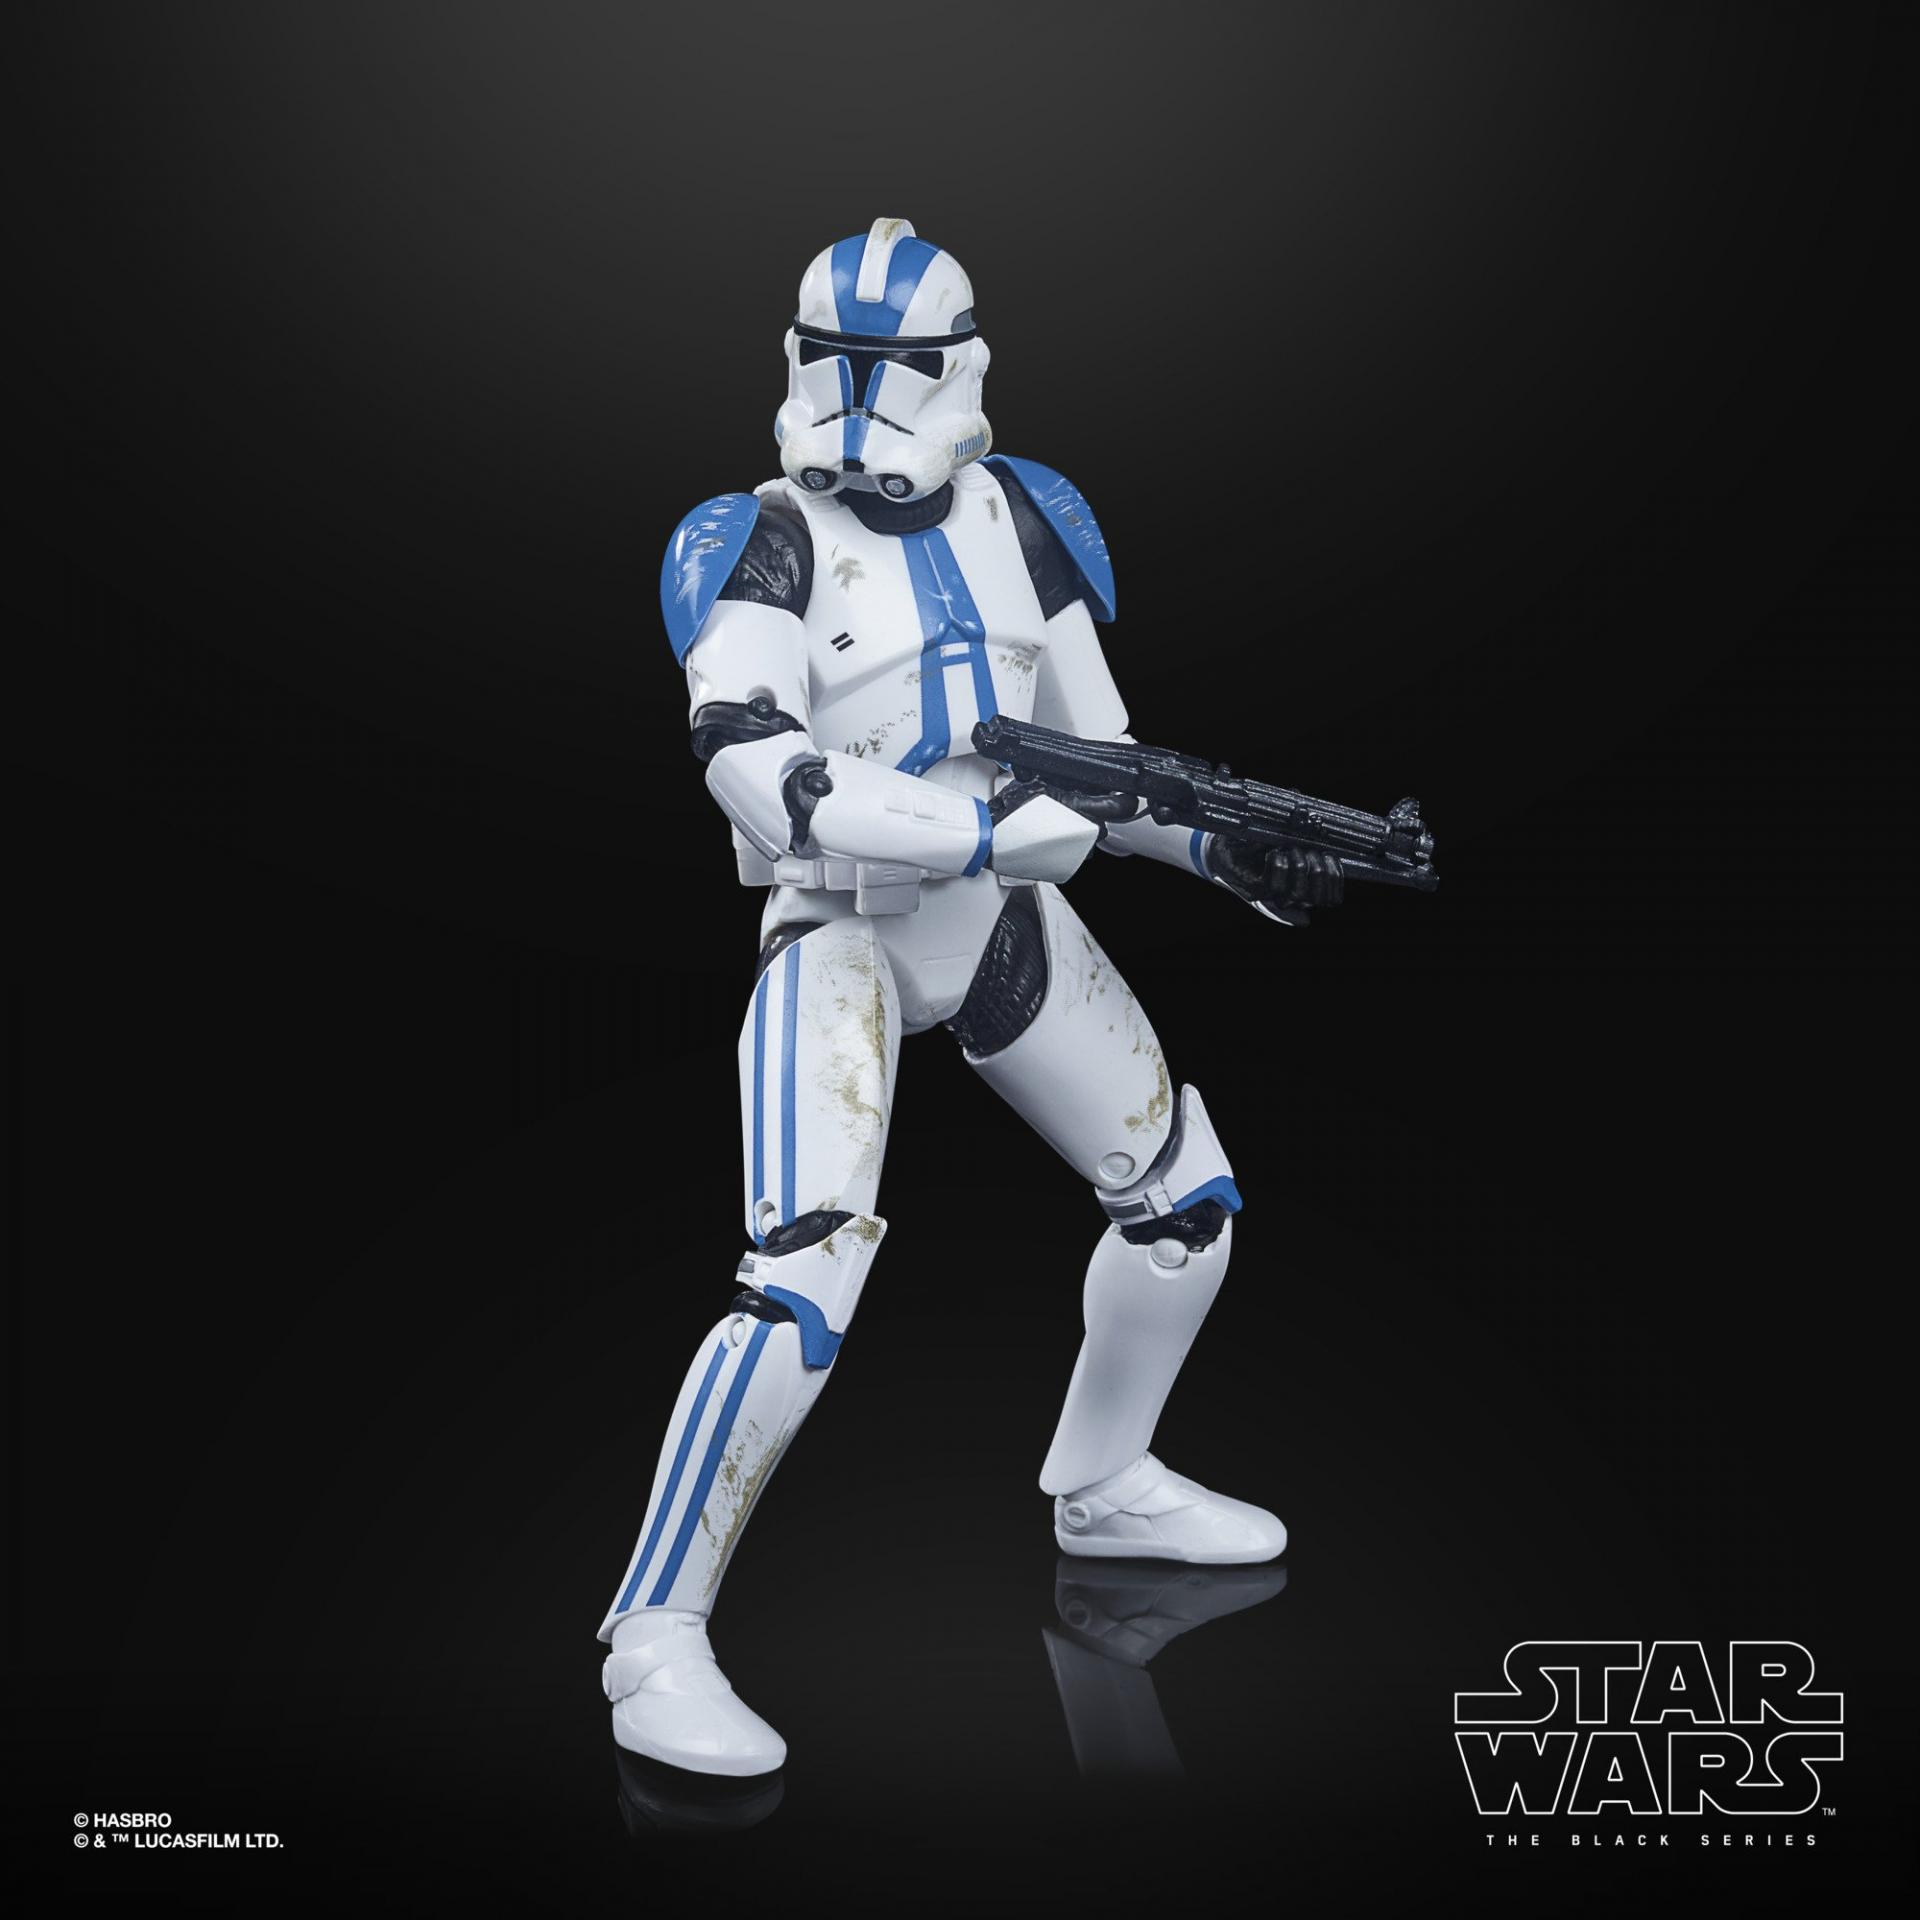 Star wars the black series archive 501st legion clone trooper 15cm3